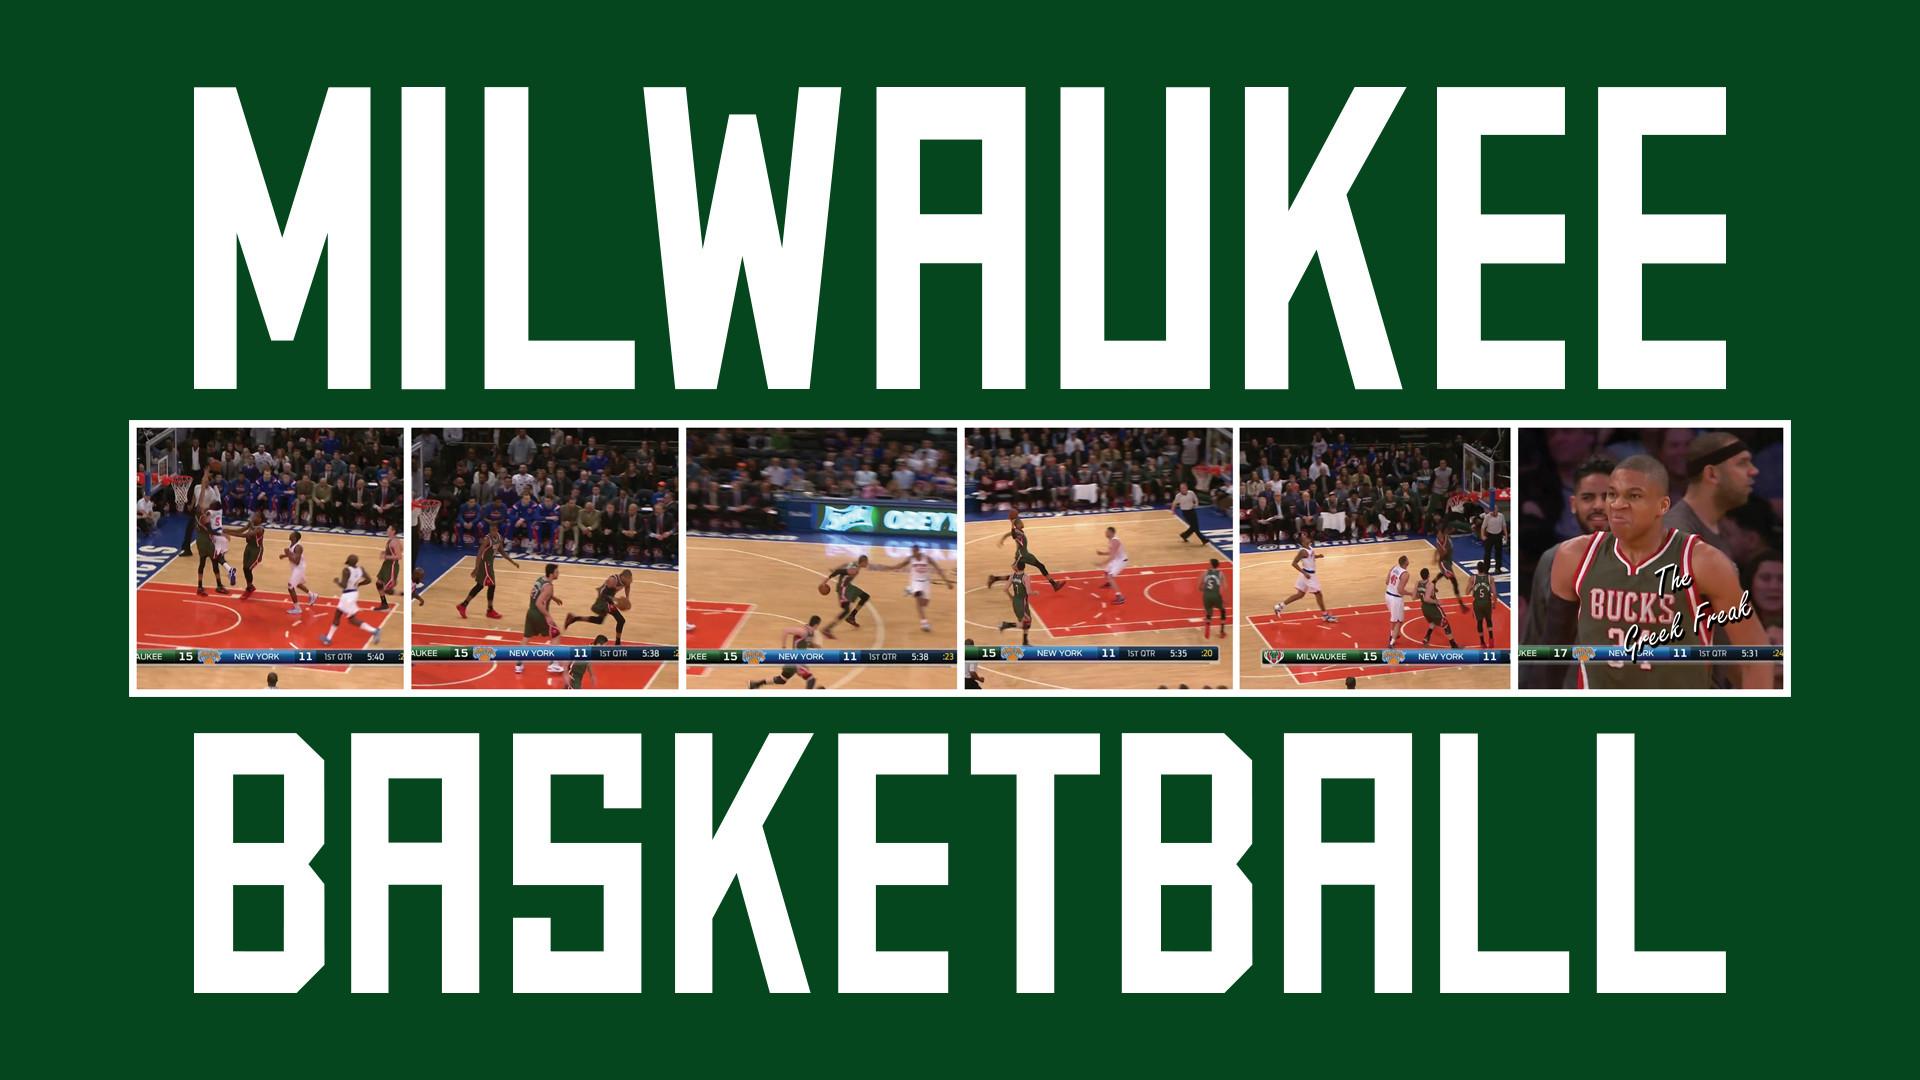 Milwaukee Bucks Basketball [wallpaper]